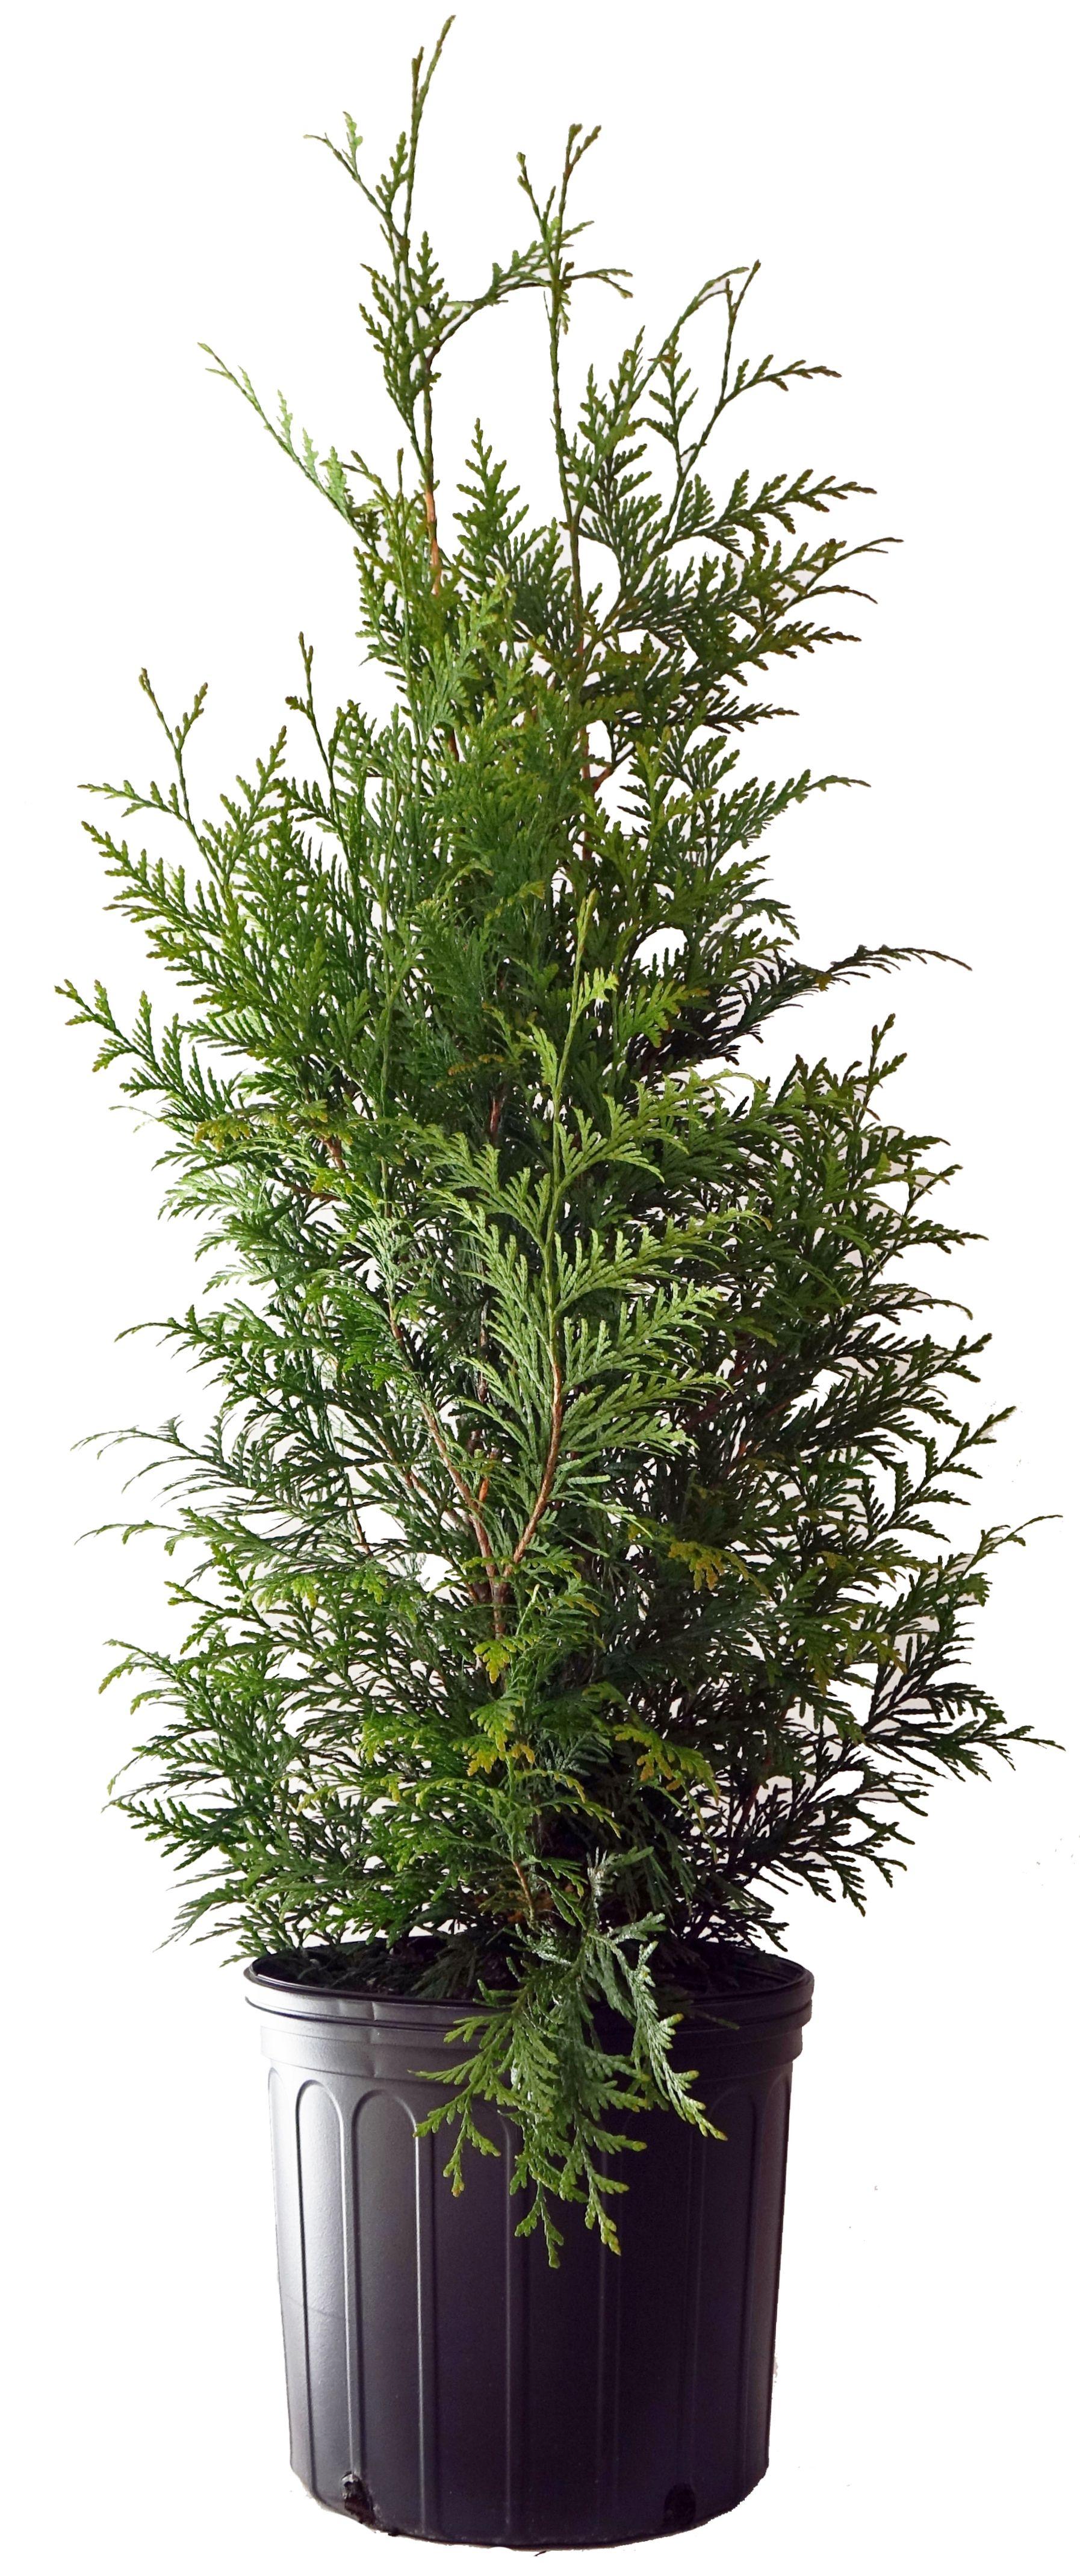 Mature plants fast photos 268